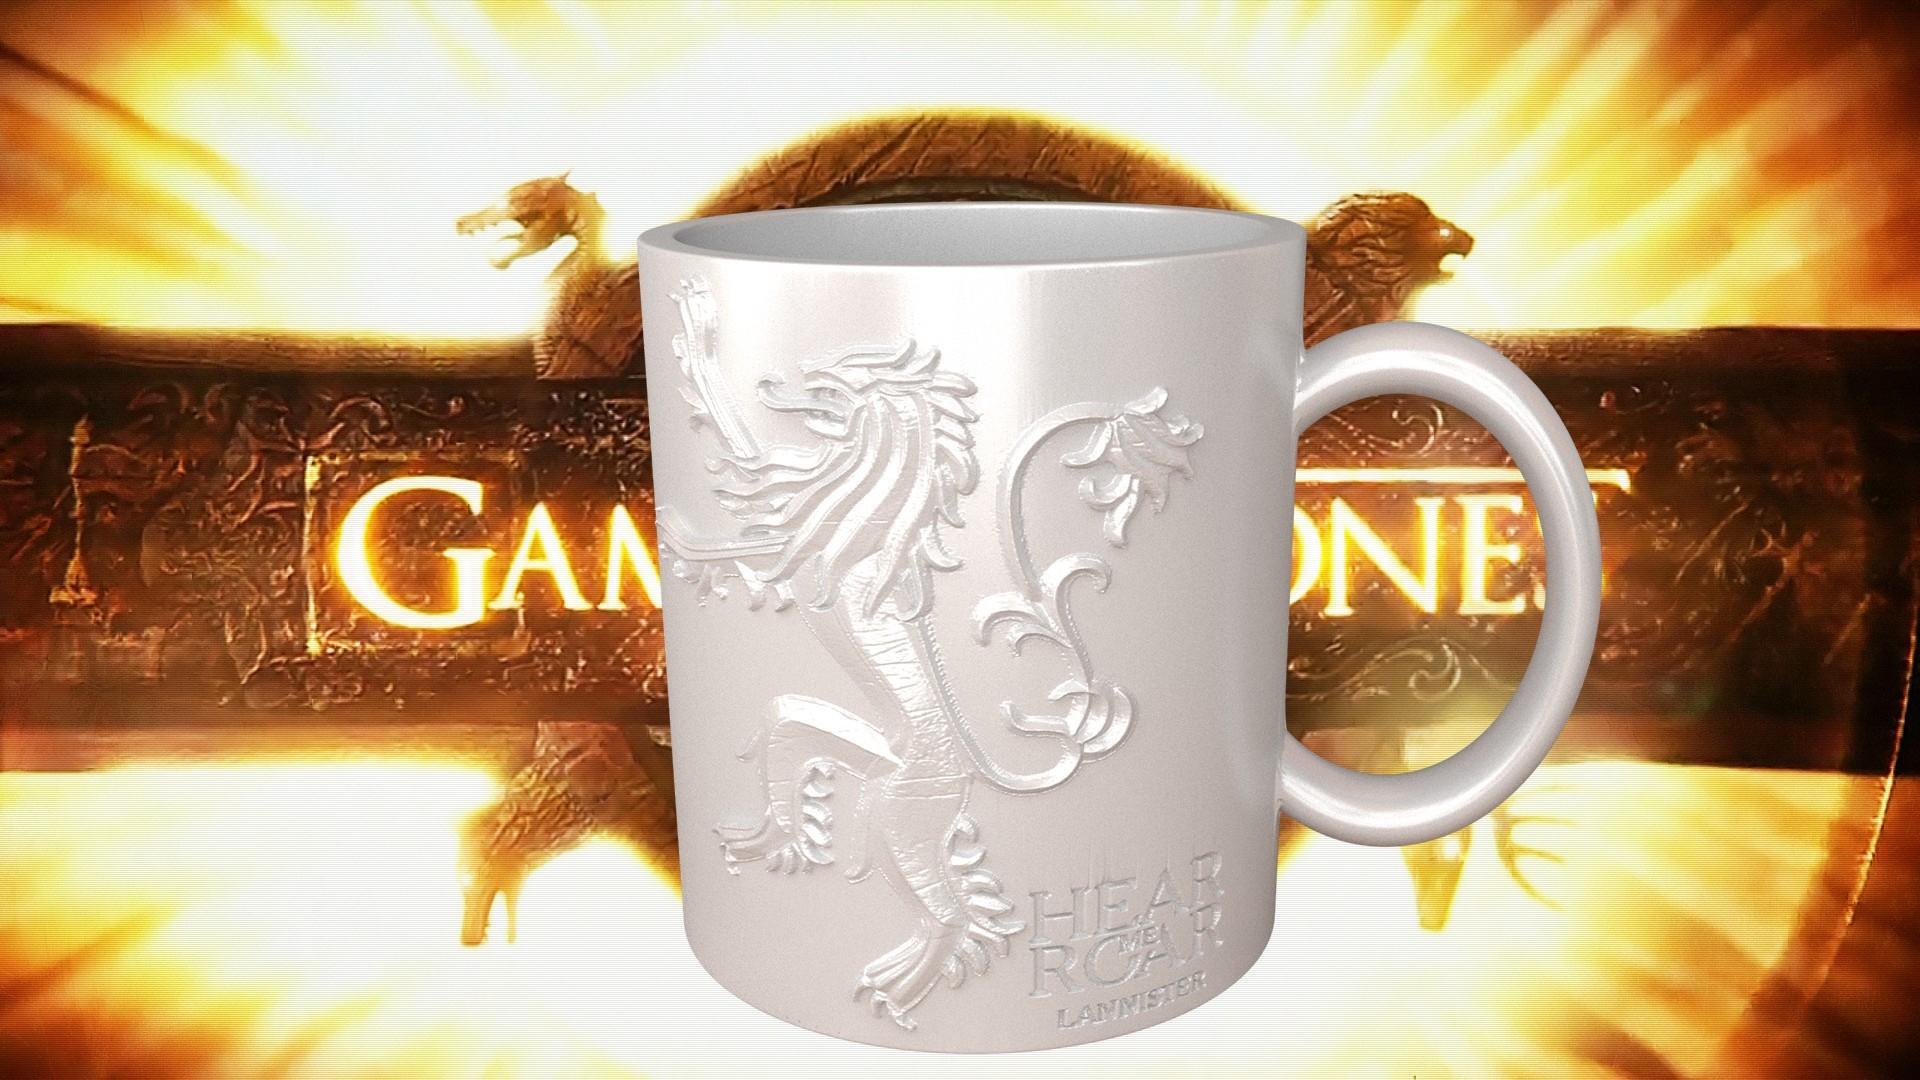 3.1.jpg Download STL file Game Of Thrones Lannister Coffee Mug • 3D printable model, SimaDesign